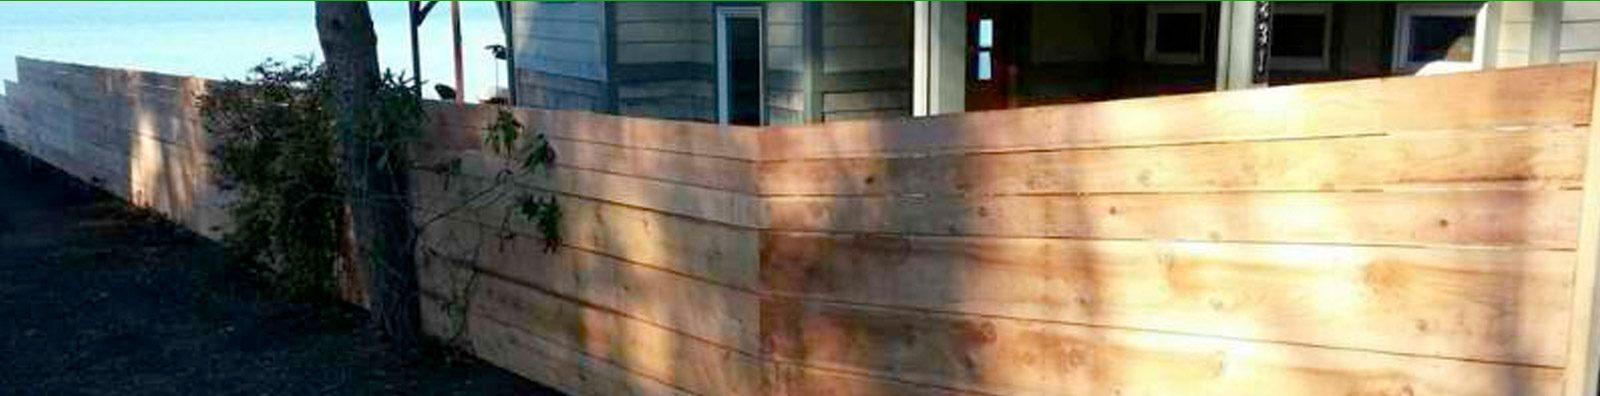 Bathroom Remodel Kitsap County gilbertsen enterprises - port orchard, wa remodeling services